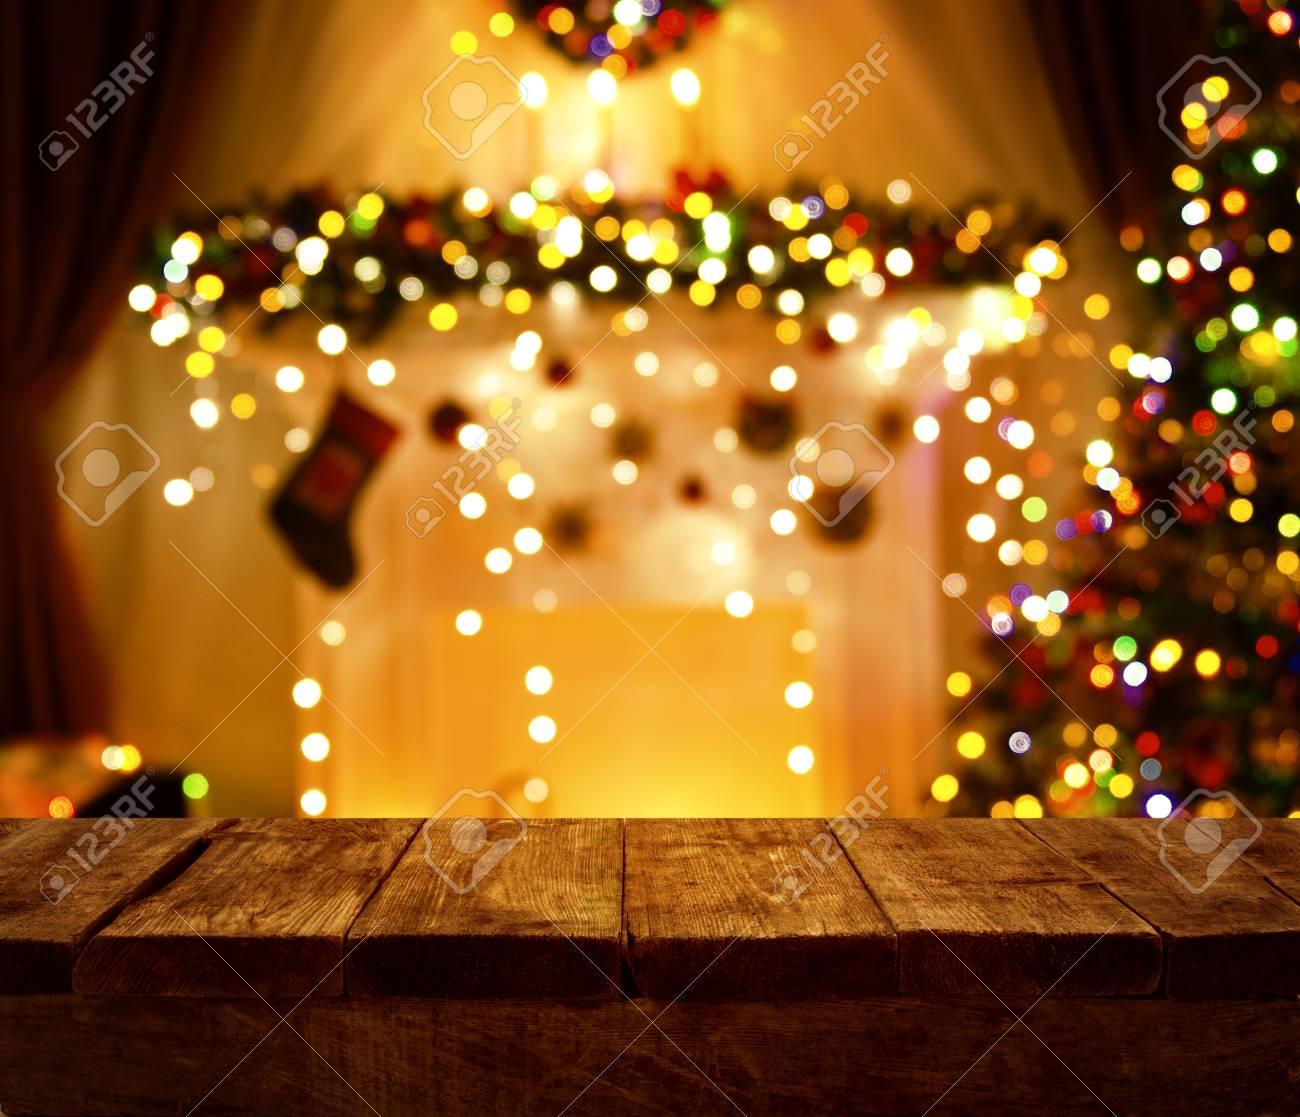 Christmas Kitchen Wood Table Xmas Holiday Night Lights Empty Wooden Desk Stock Photo - & Christmas Kitchen Wood Table Xmas Holiday Night Lights Empty ...